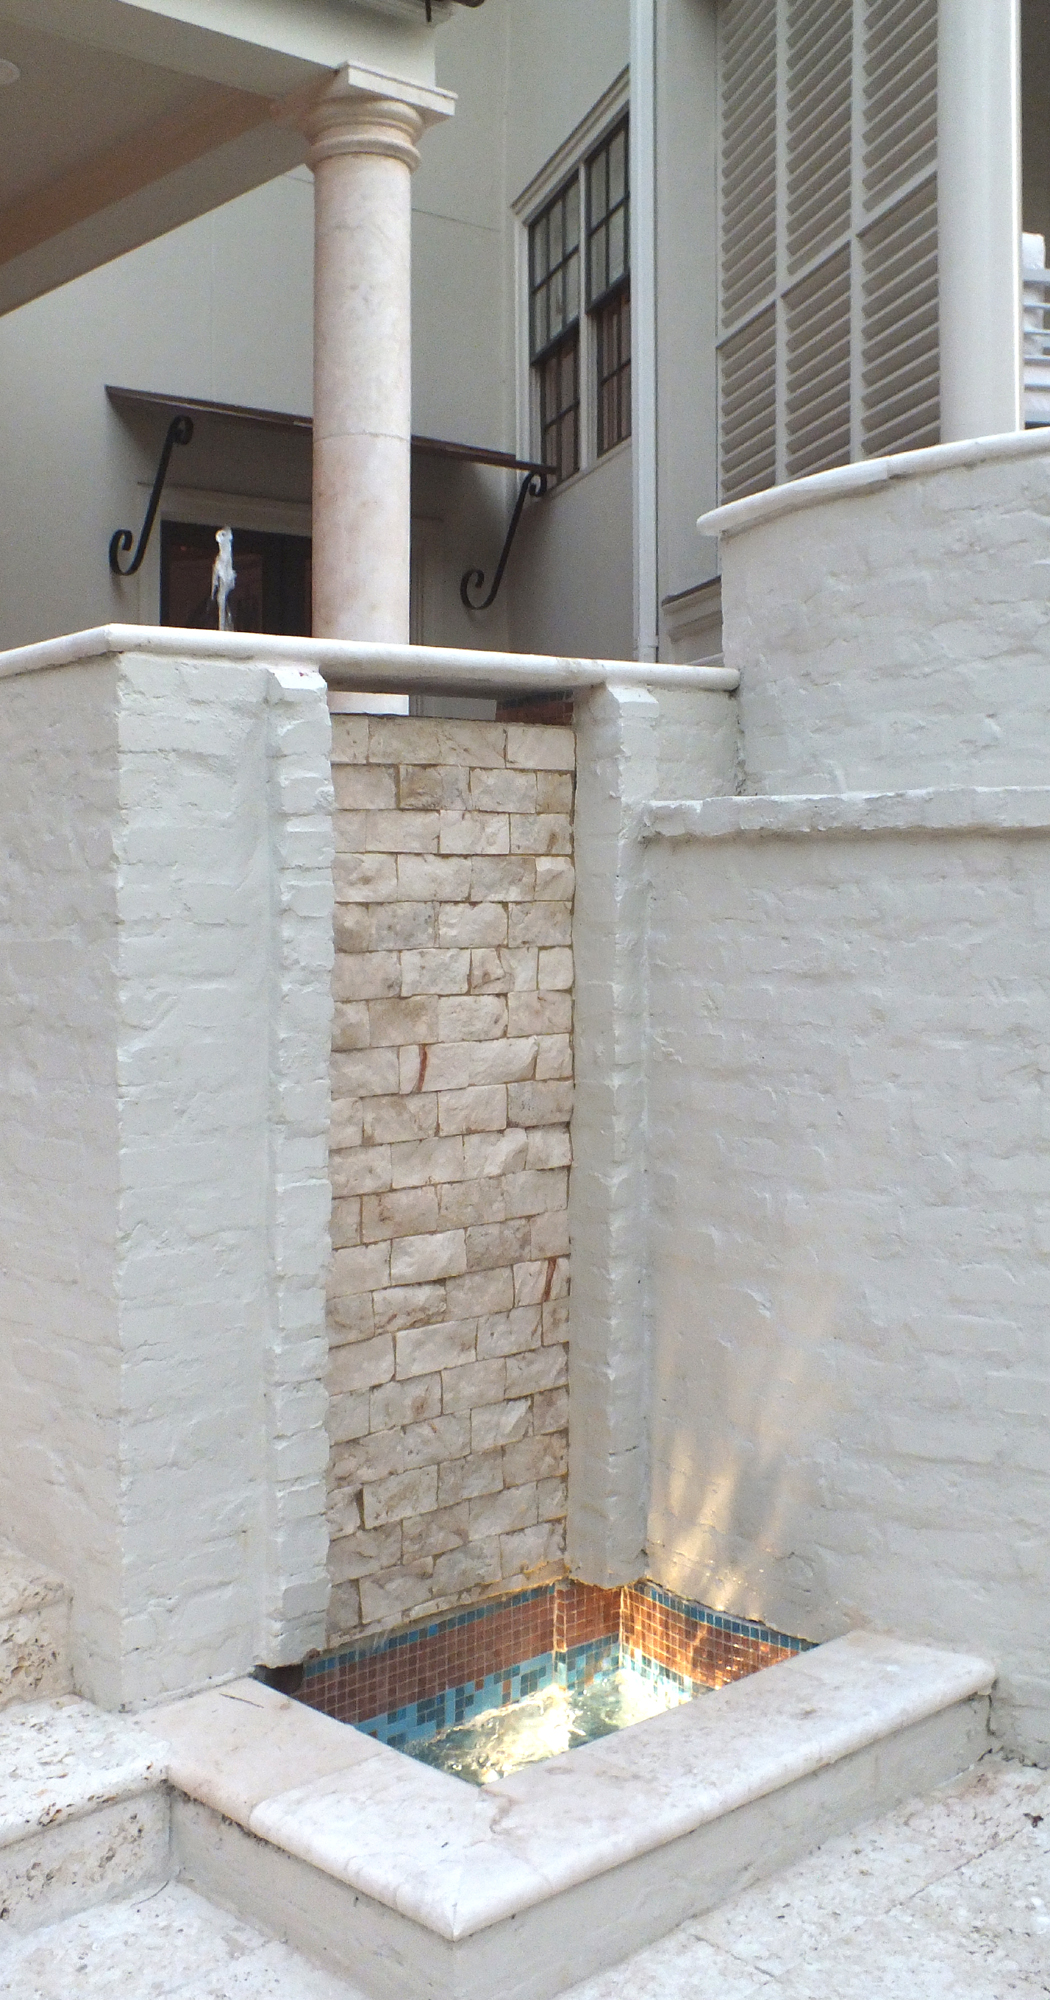 Historic District16_Beven_Lower fountain chisel face_1050x2000_DSCF1189.jpg